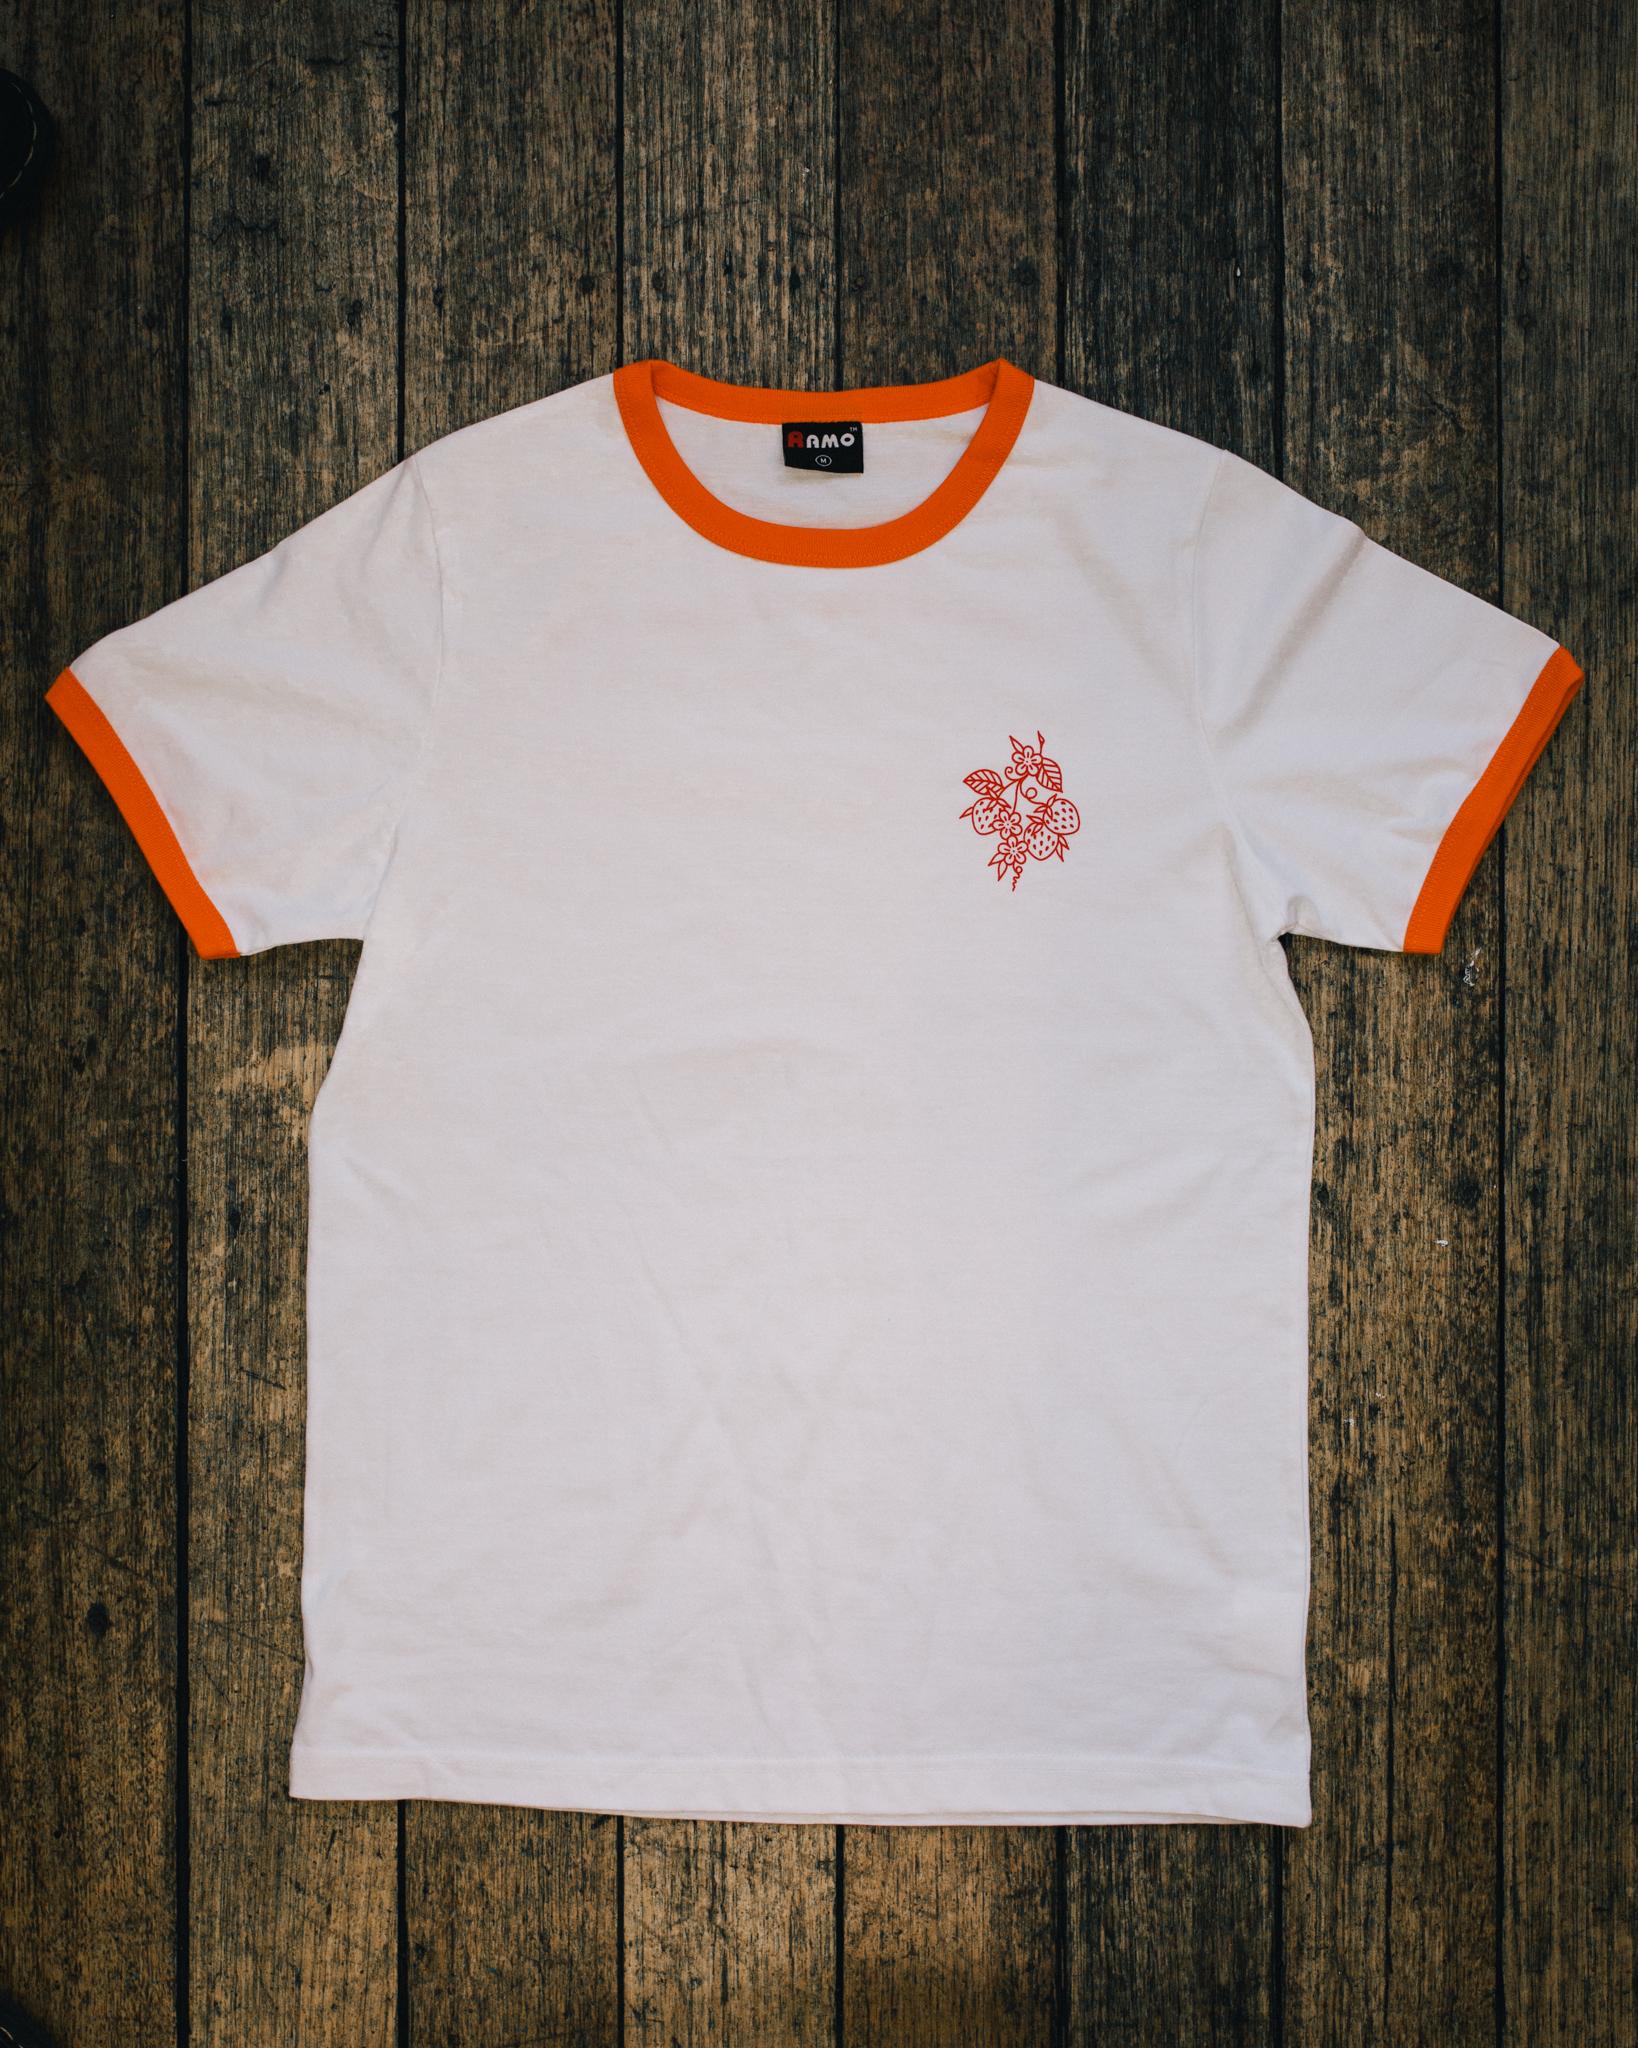 rolan_john_photo_Zoe_strawberry_shirt-3.jpg